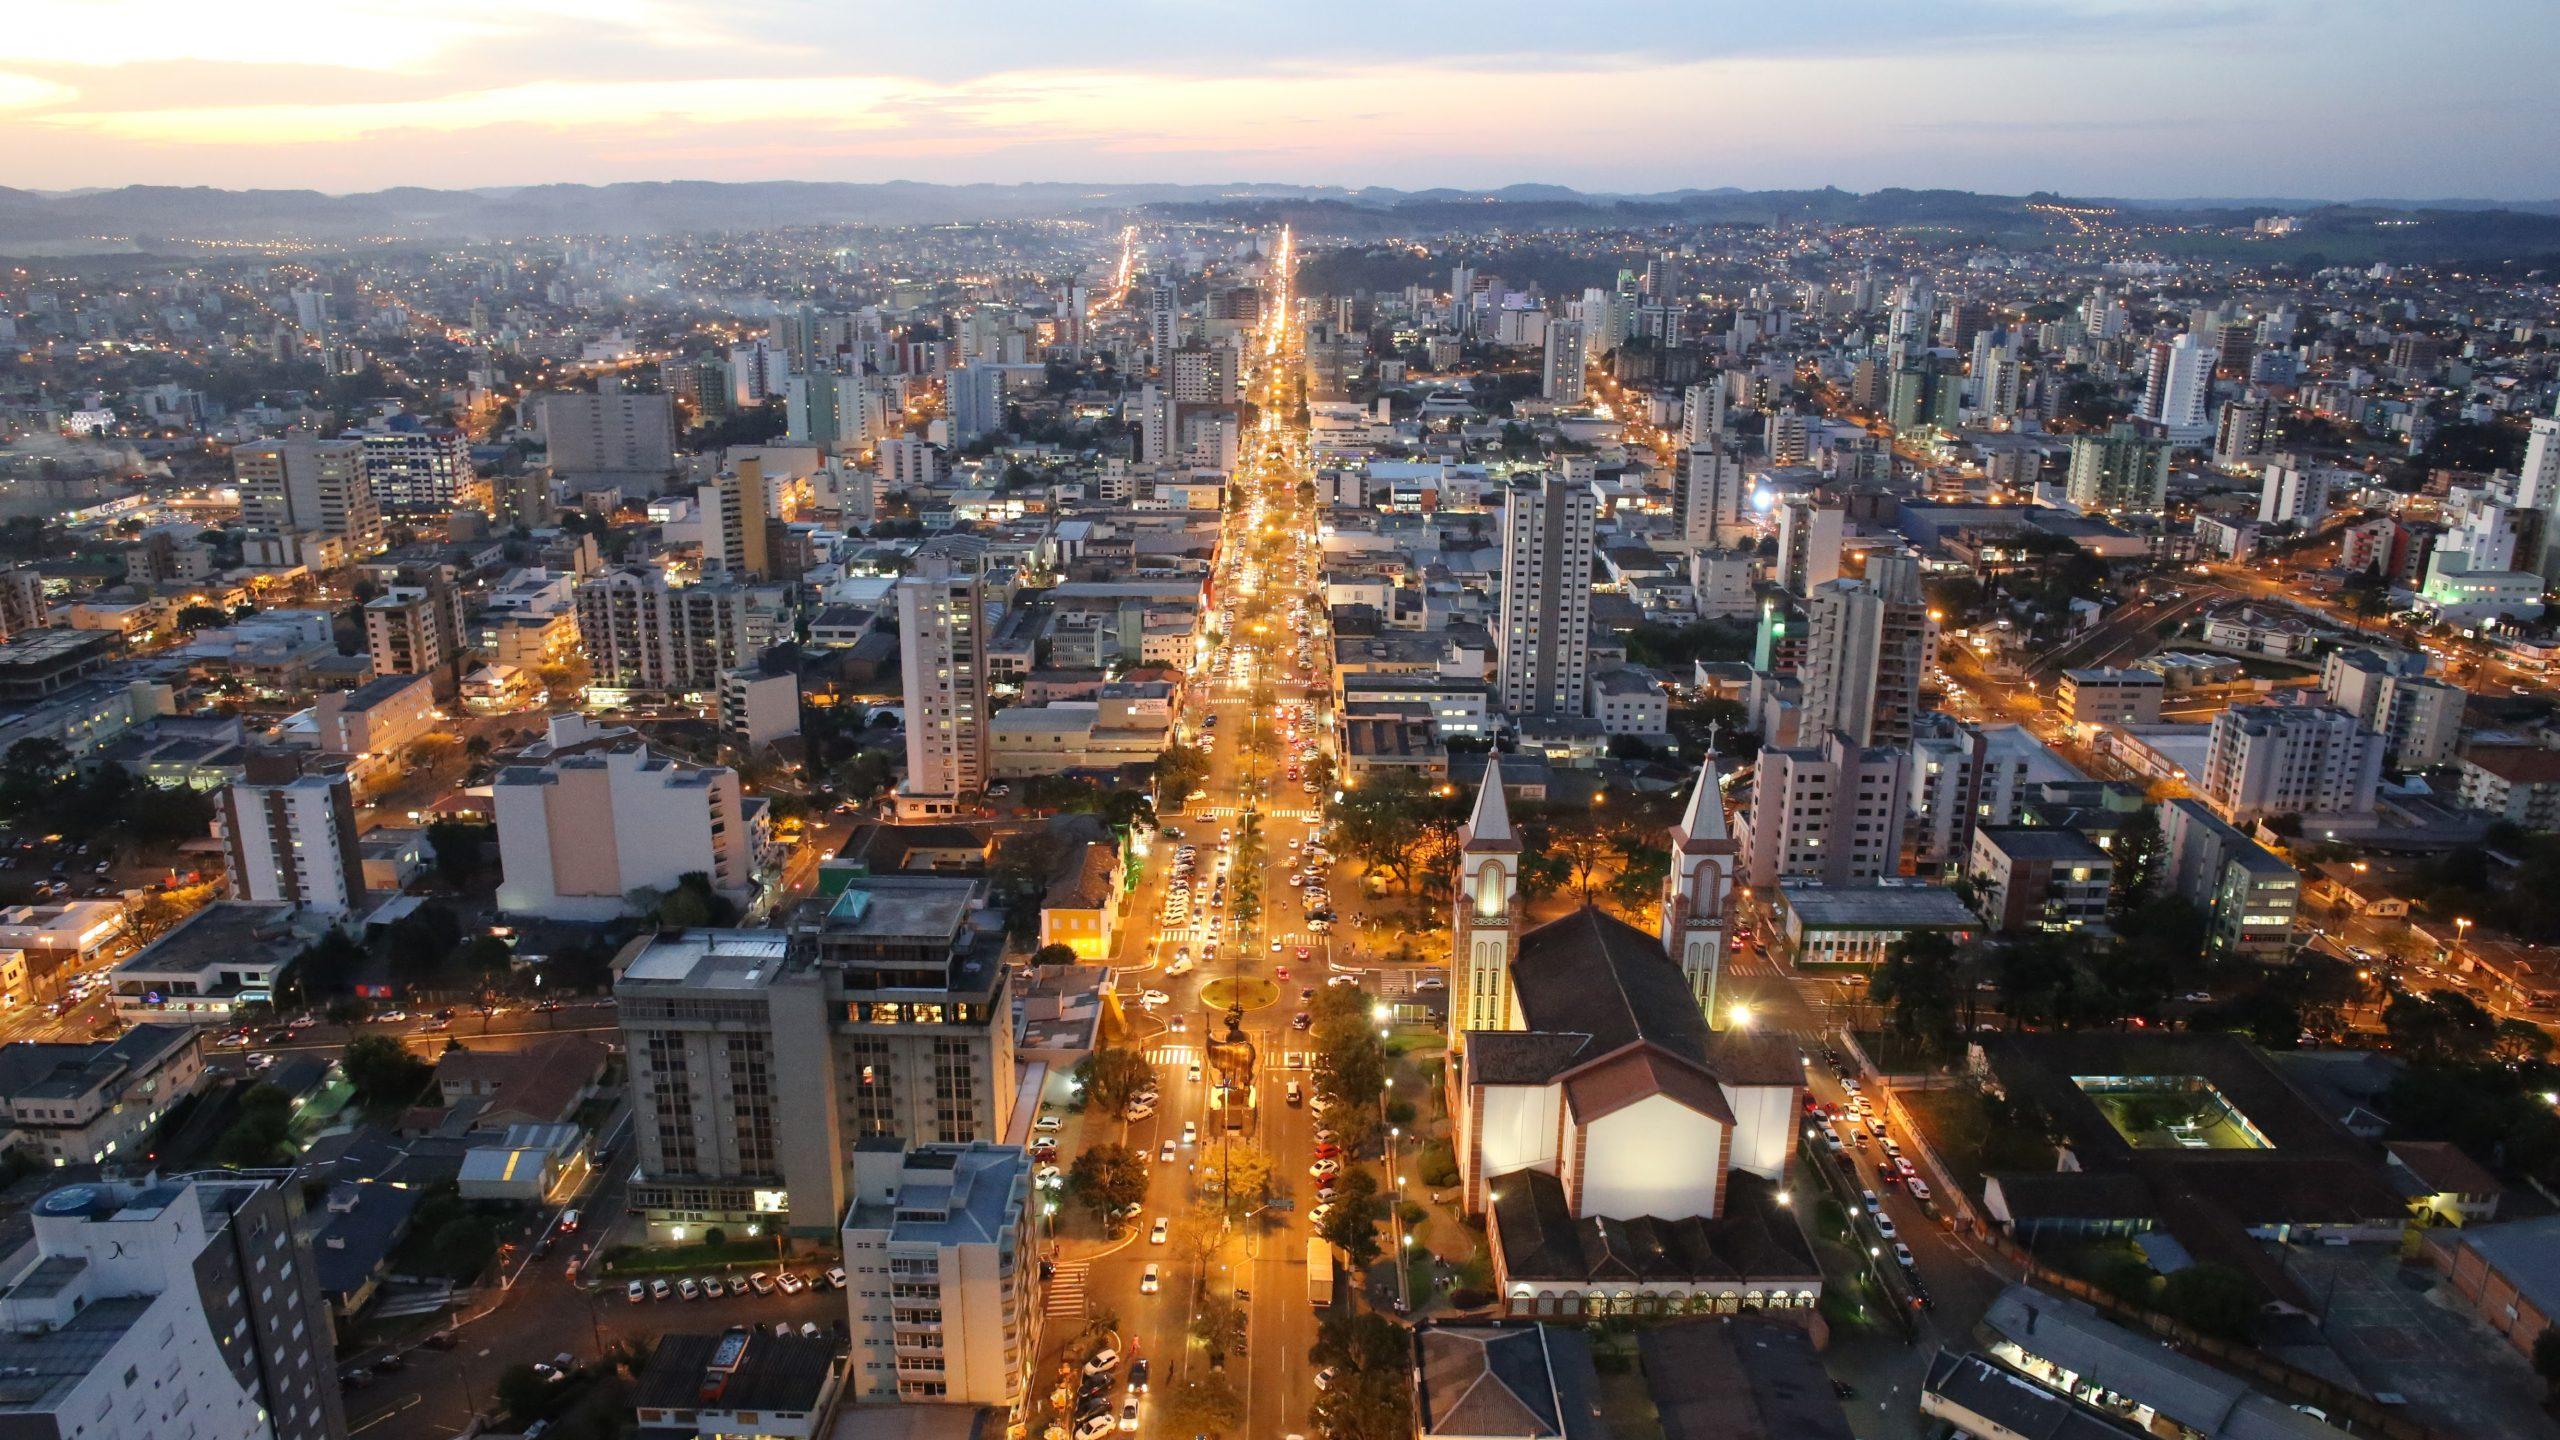 Chapecó Santa Catarina fonte: static.ndonline.com.br